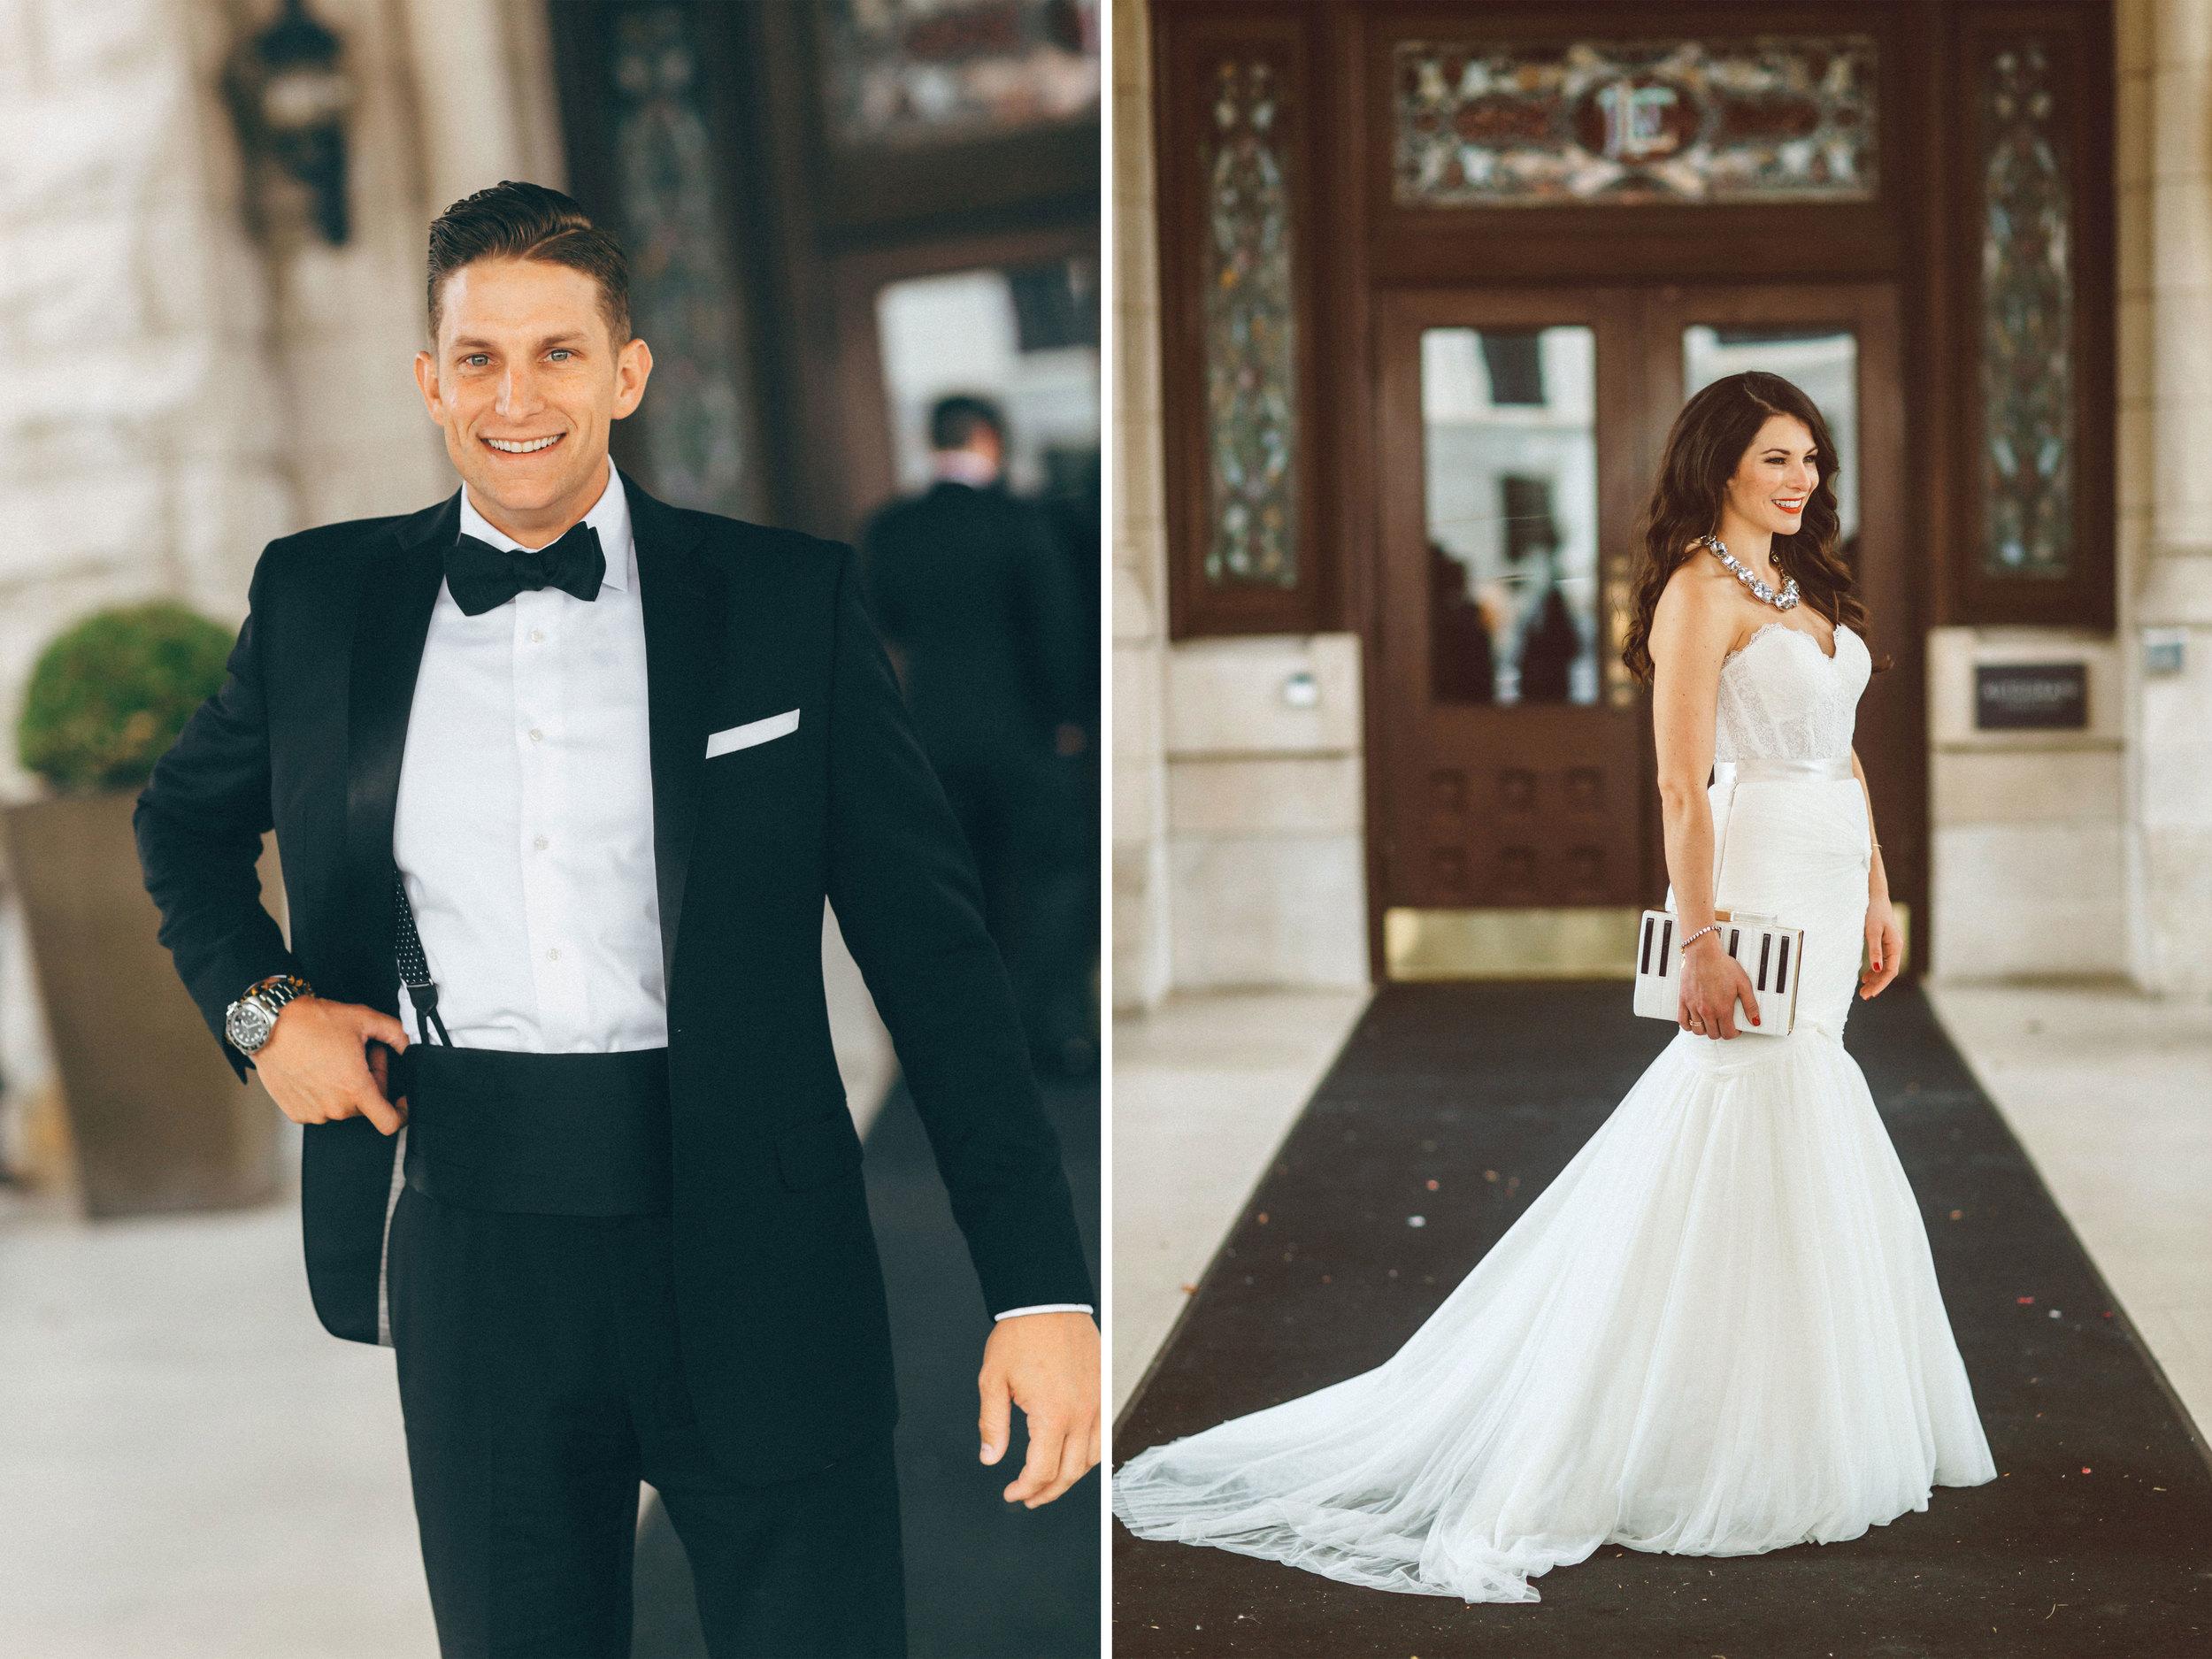 Me & Mr. Jones Wedding, Bride and Groom Portraits at Union Station Hotel, Nashville Wedding, Black Tie Wedding